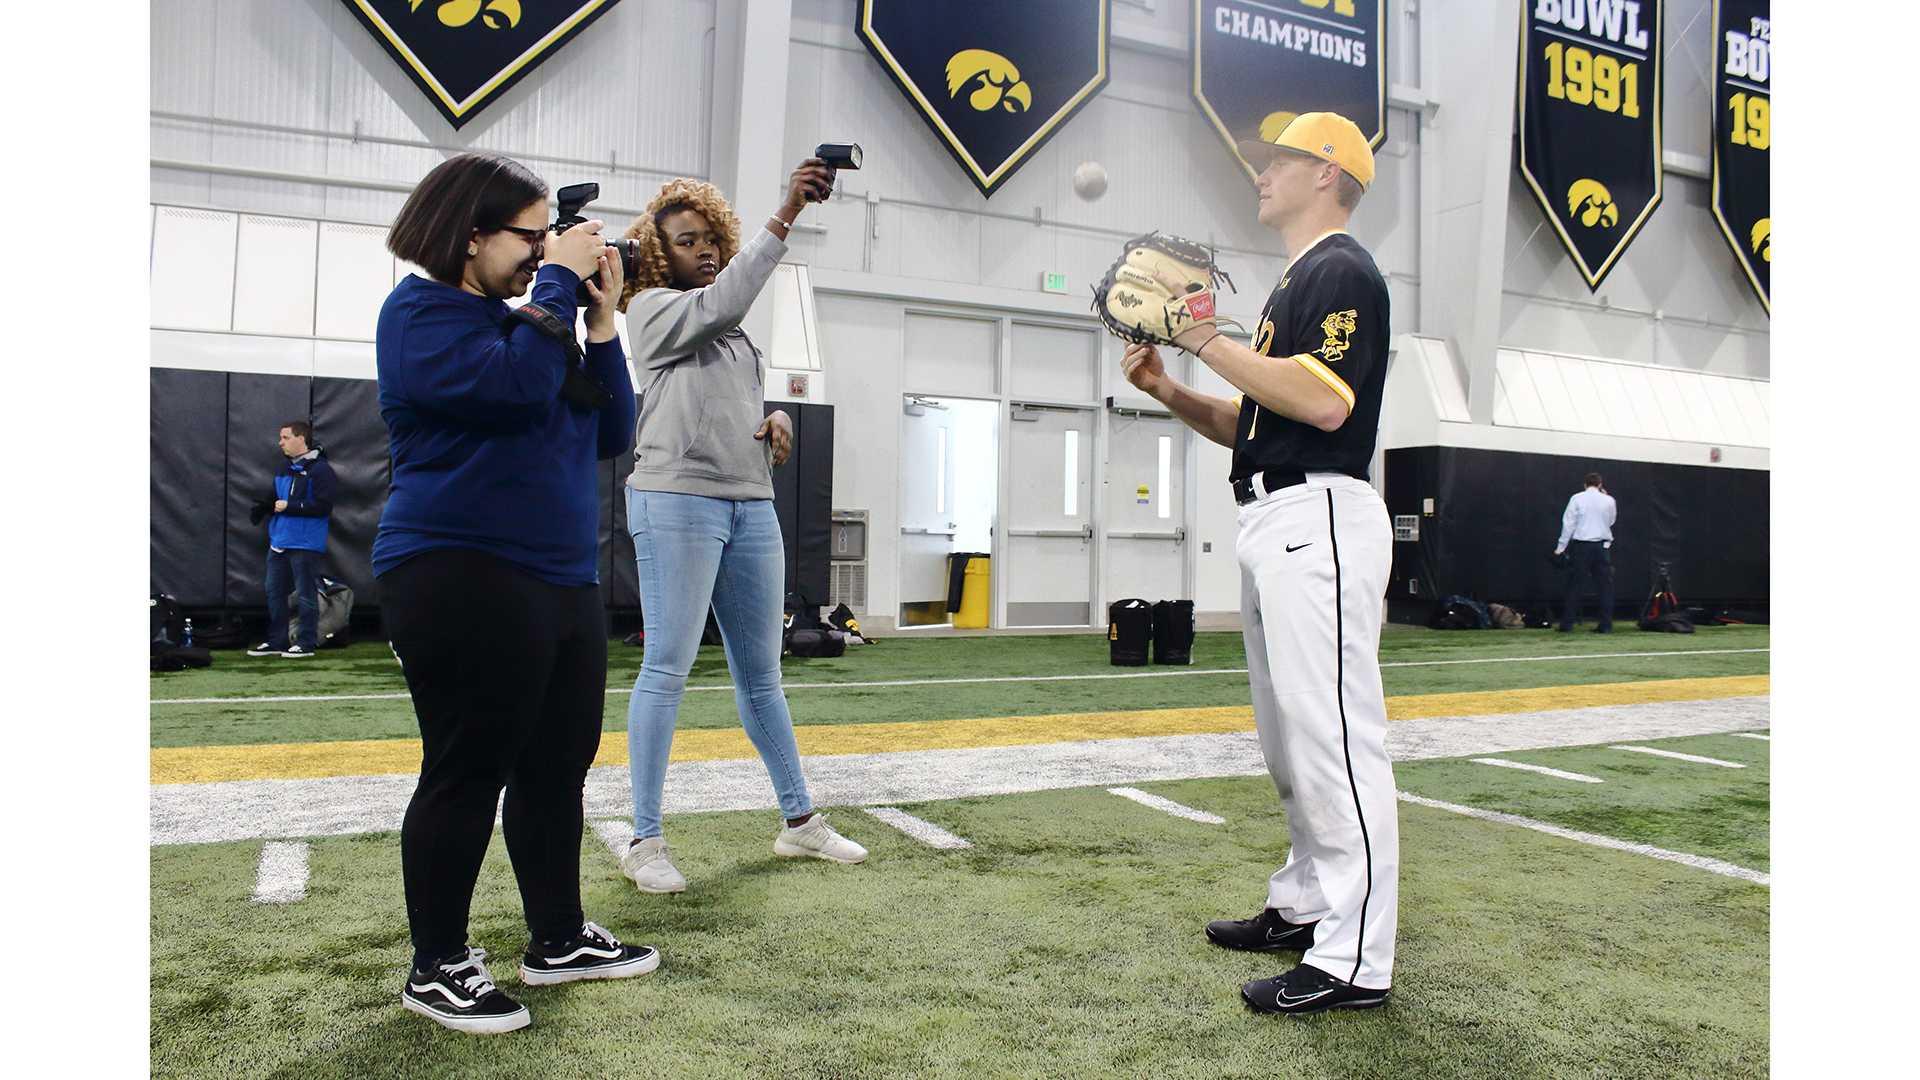 From left: Daily Iowan photo editor Lily Smith and Ashol Aguek photograph Iowa catcher Tyler Cropley at Baseball Media Day on February 8, 2018. (Ashley Morris/The Daily Iowan)